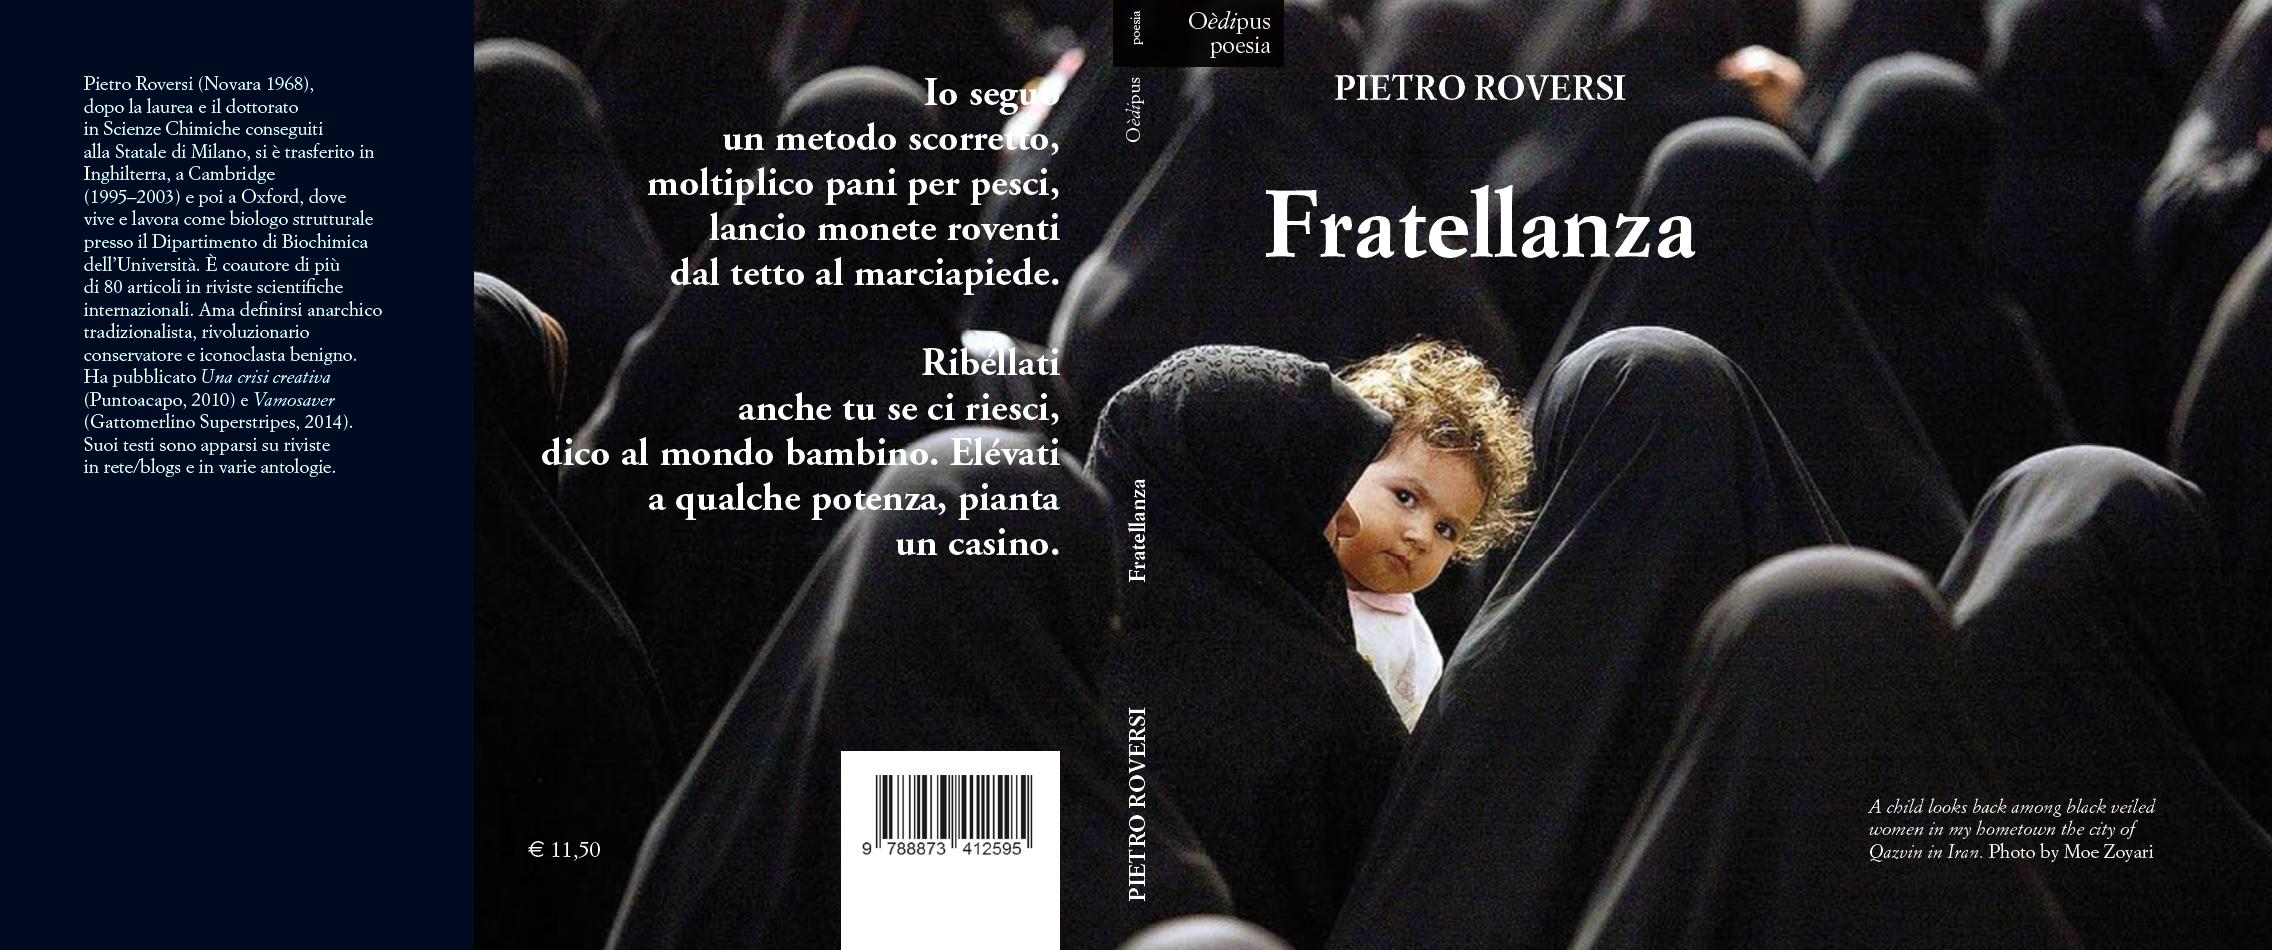 Moe_Zoyari_Book_Cover.jpg